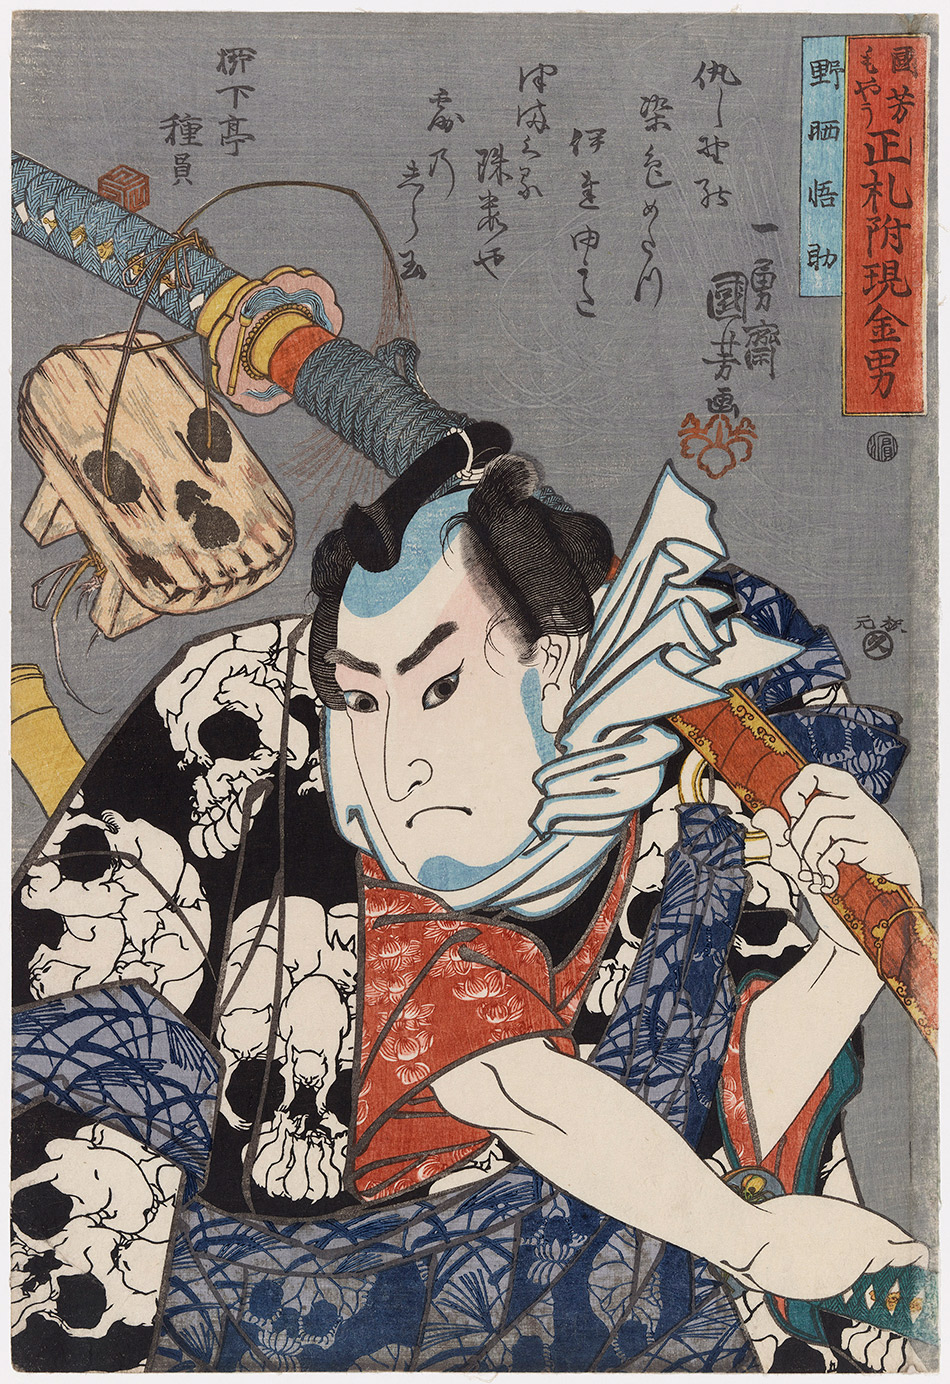 museum-of-fine-arts-boston_01.-Nozarashi-Gosuke_Utagawa-Kuniyoshi_w